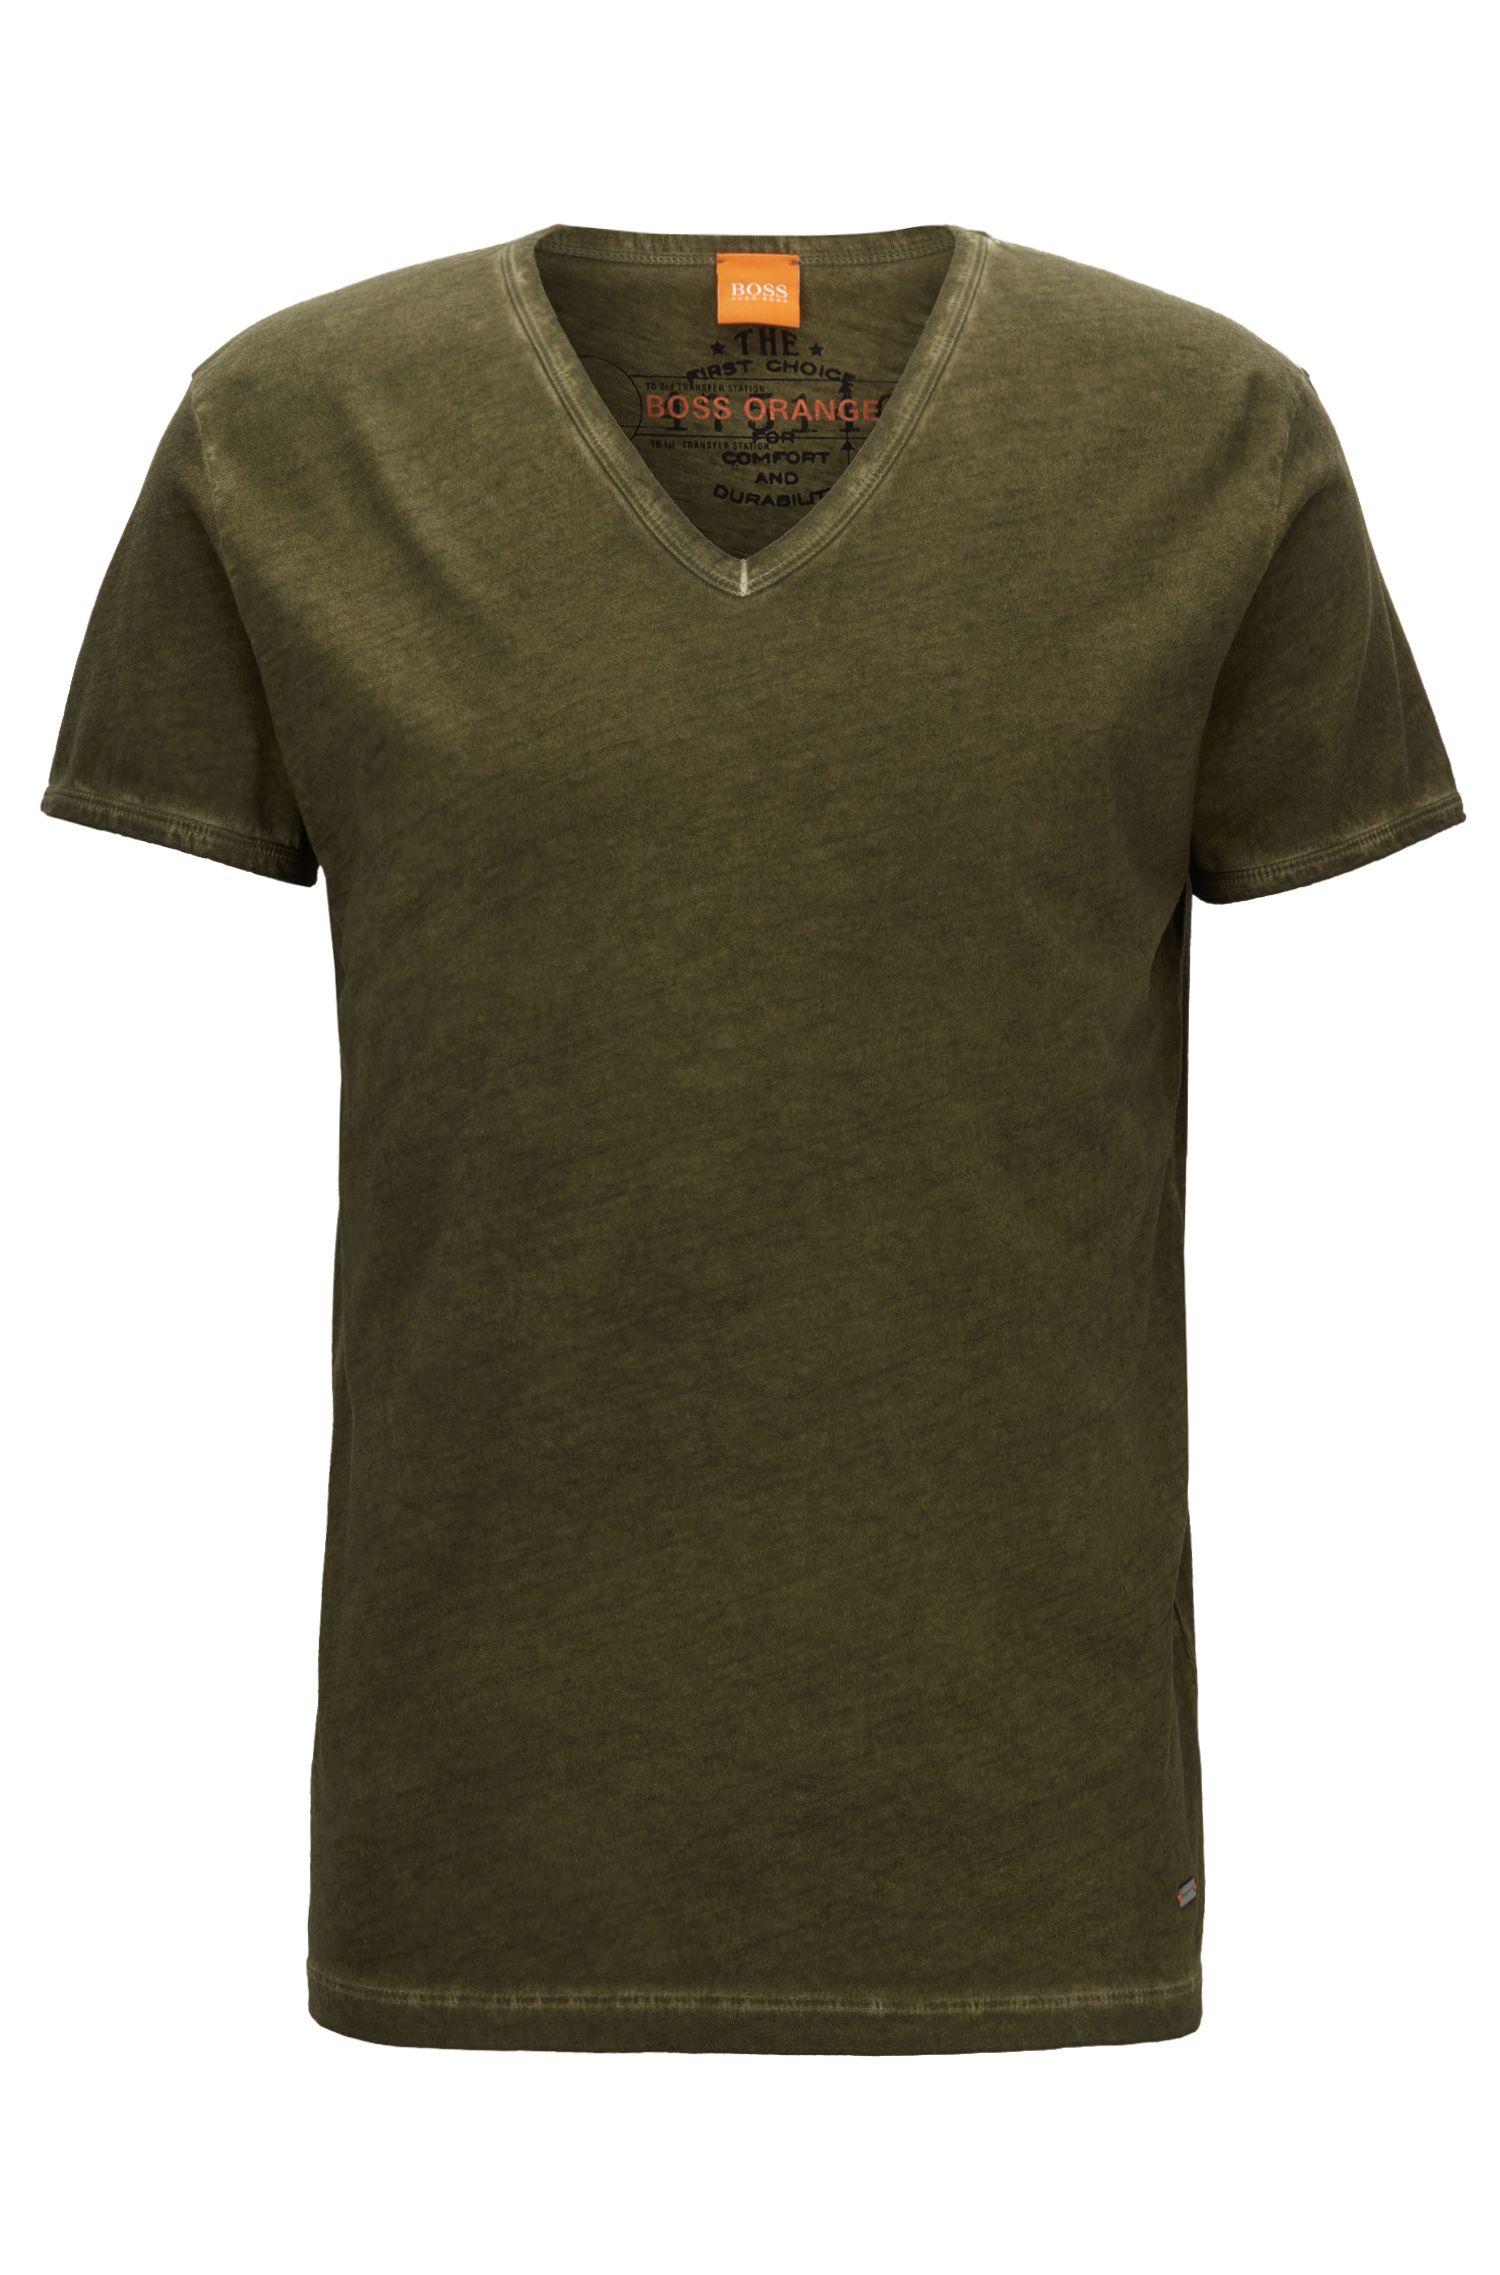 Regular-Fit T-Shirt aus stückgefärbter Baumwolle